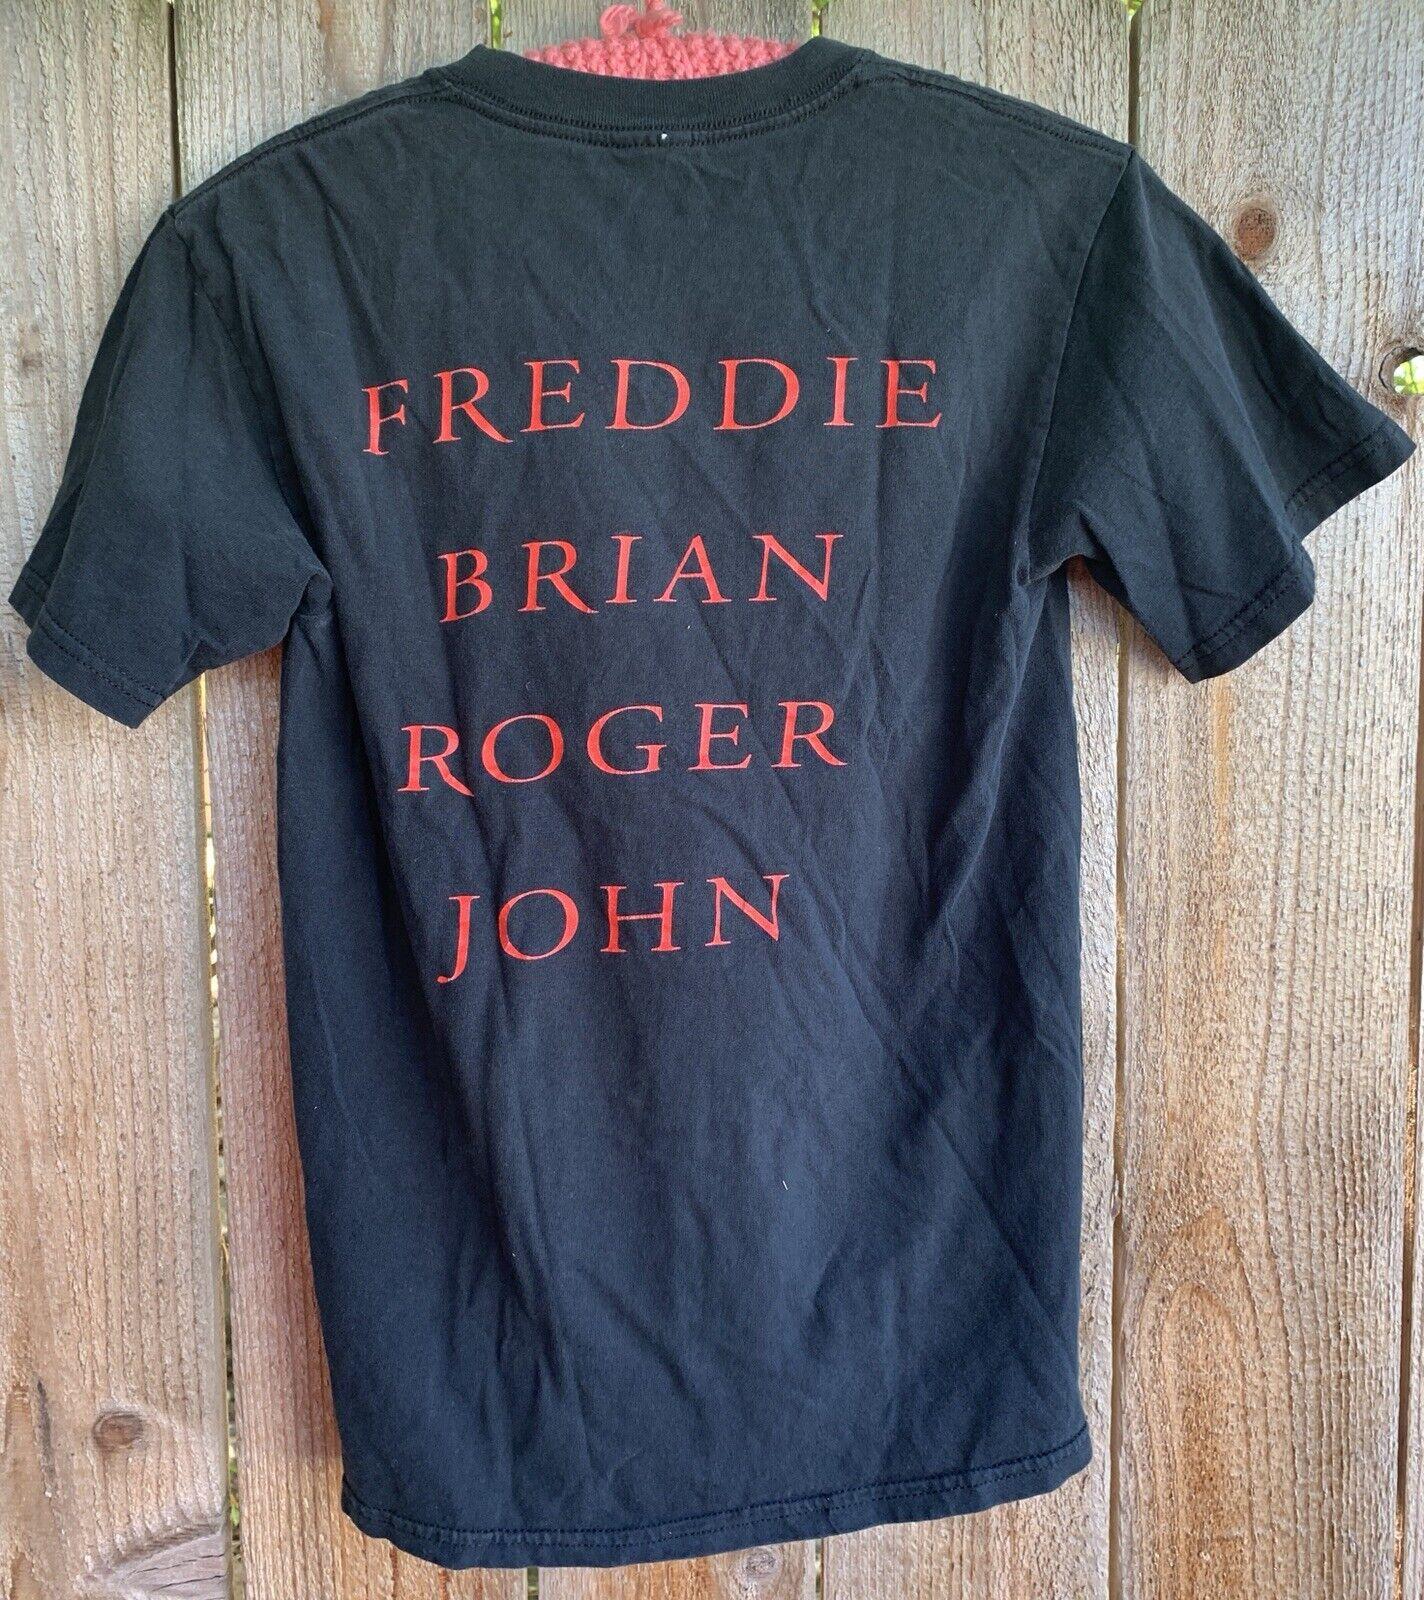 Queen Freddie Brian Roger John T-Shirt Graphics O… - image 6